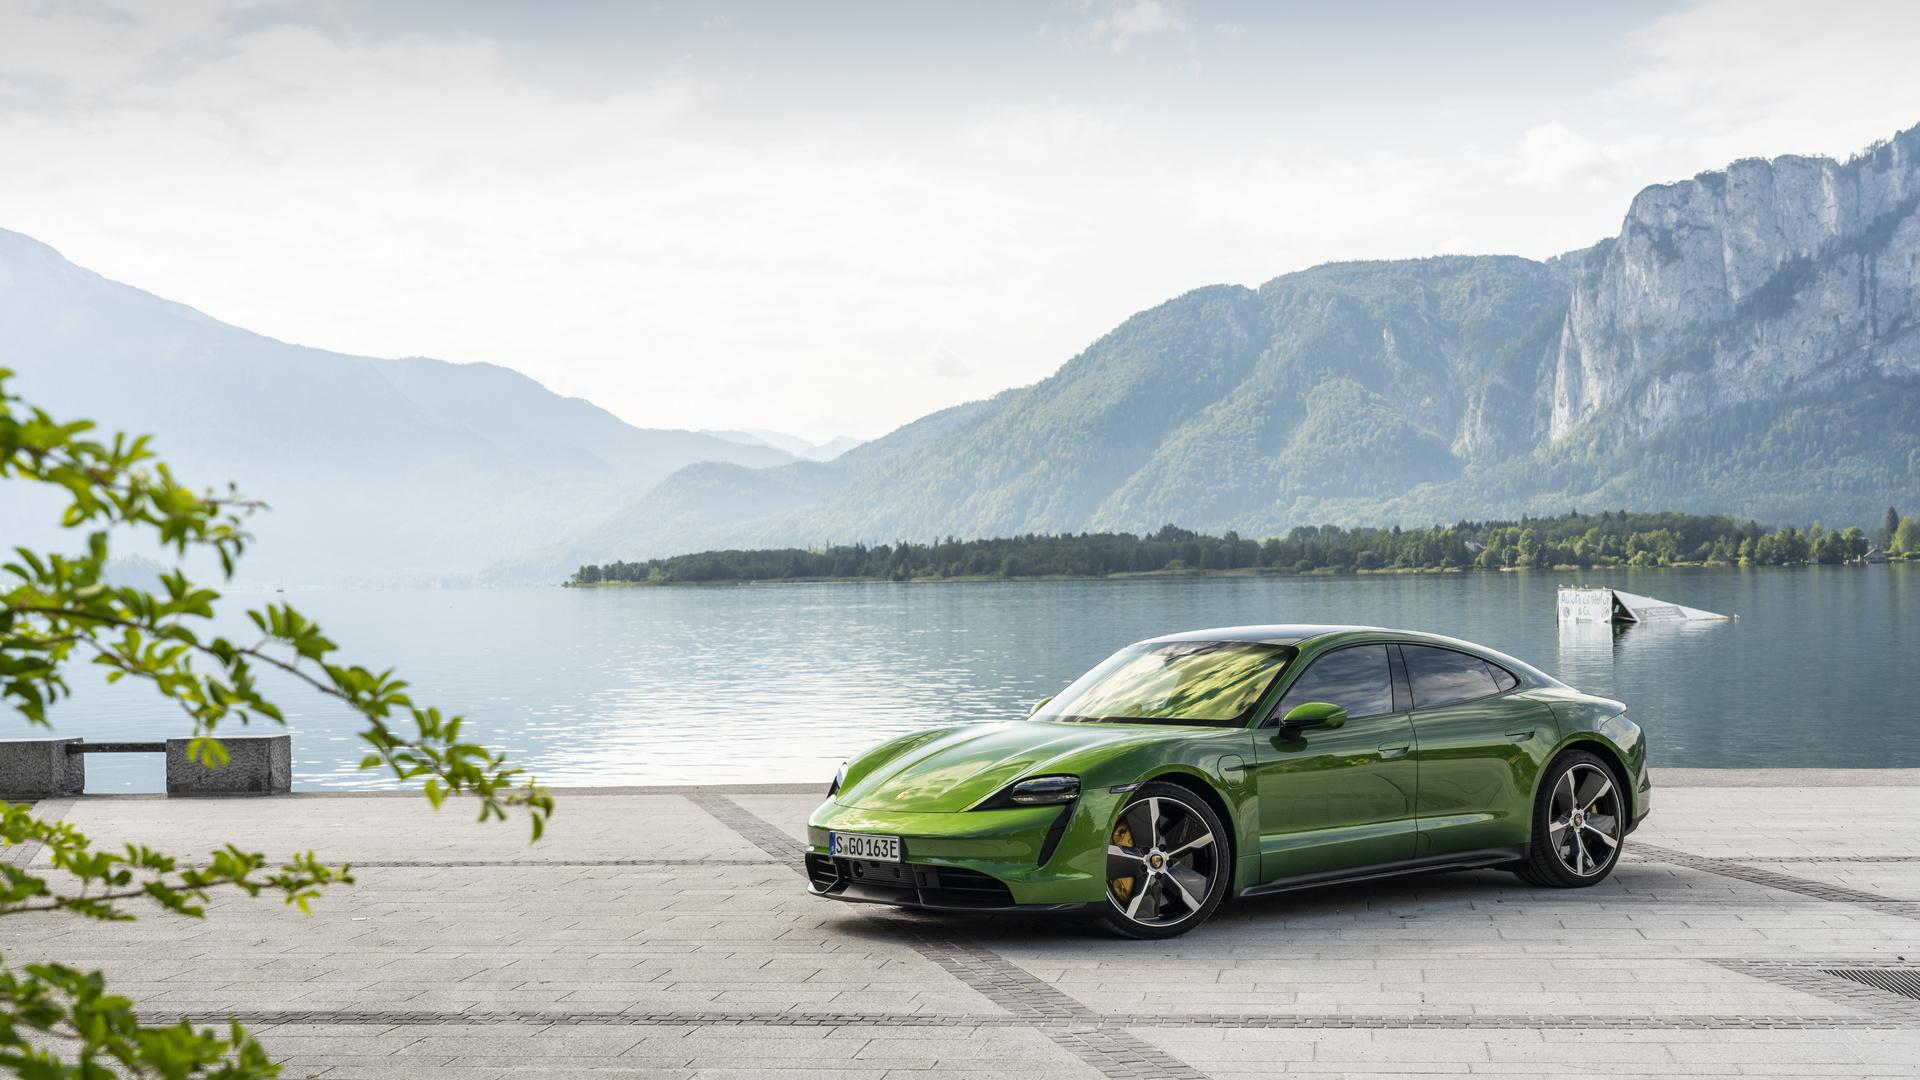 порше, зеленый, суперкар,вид сбоку,природа,фон,красиво